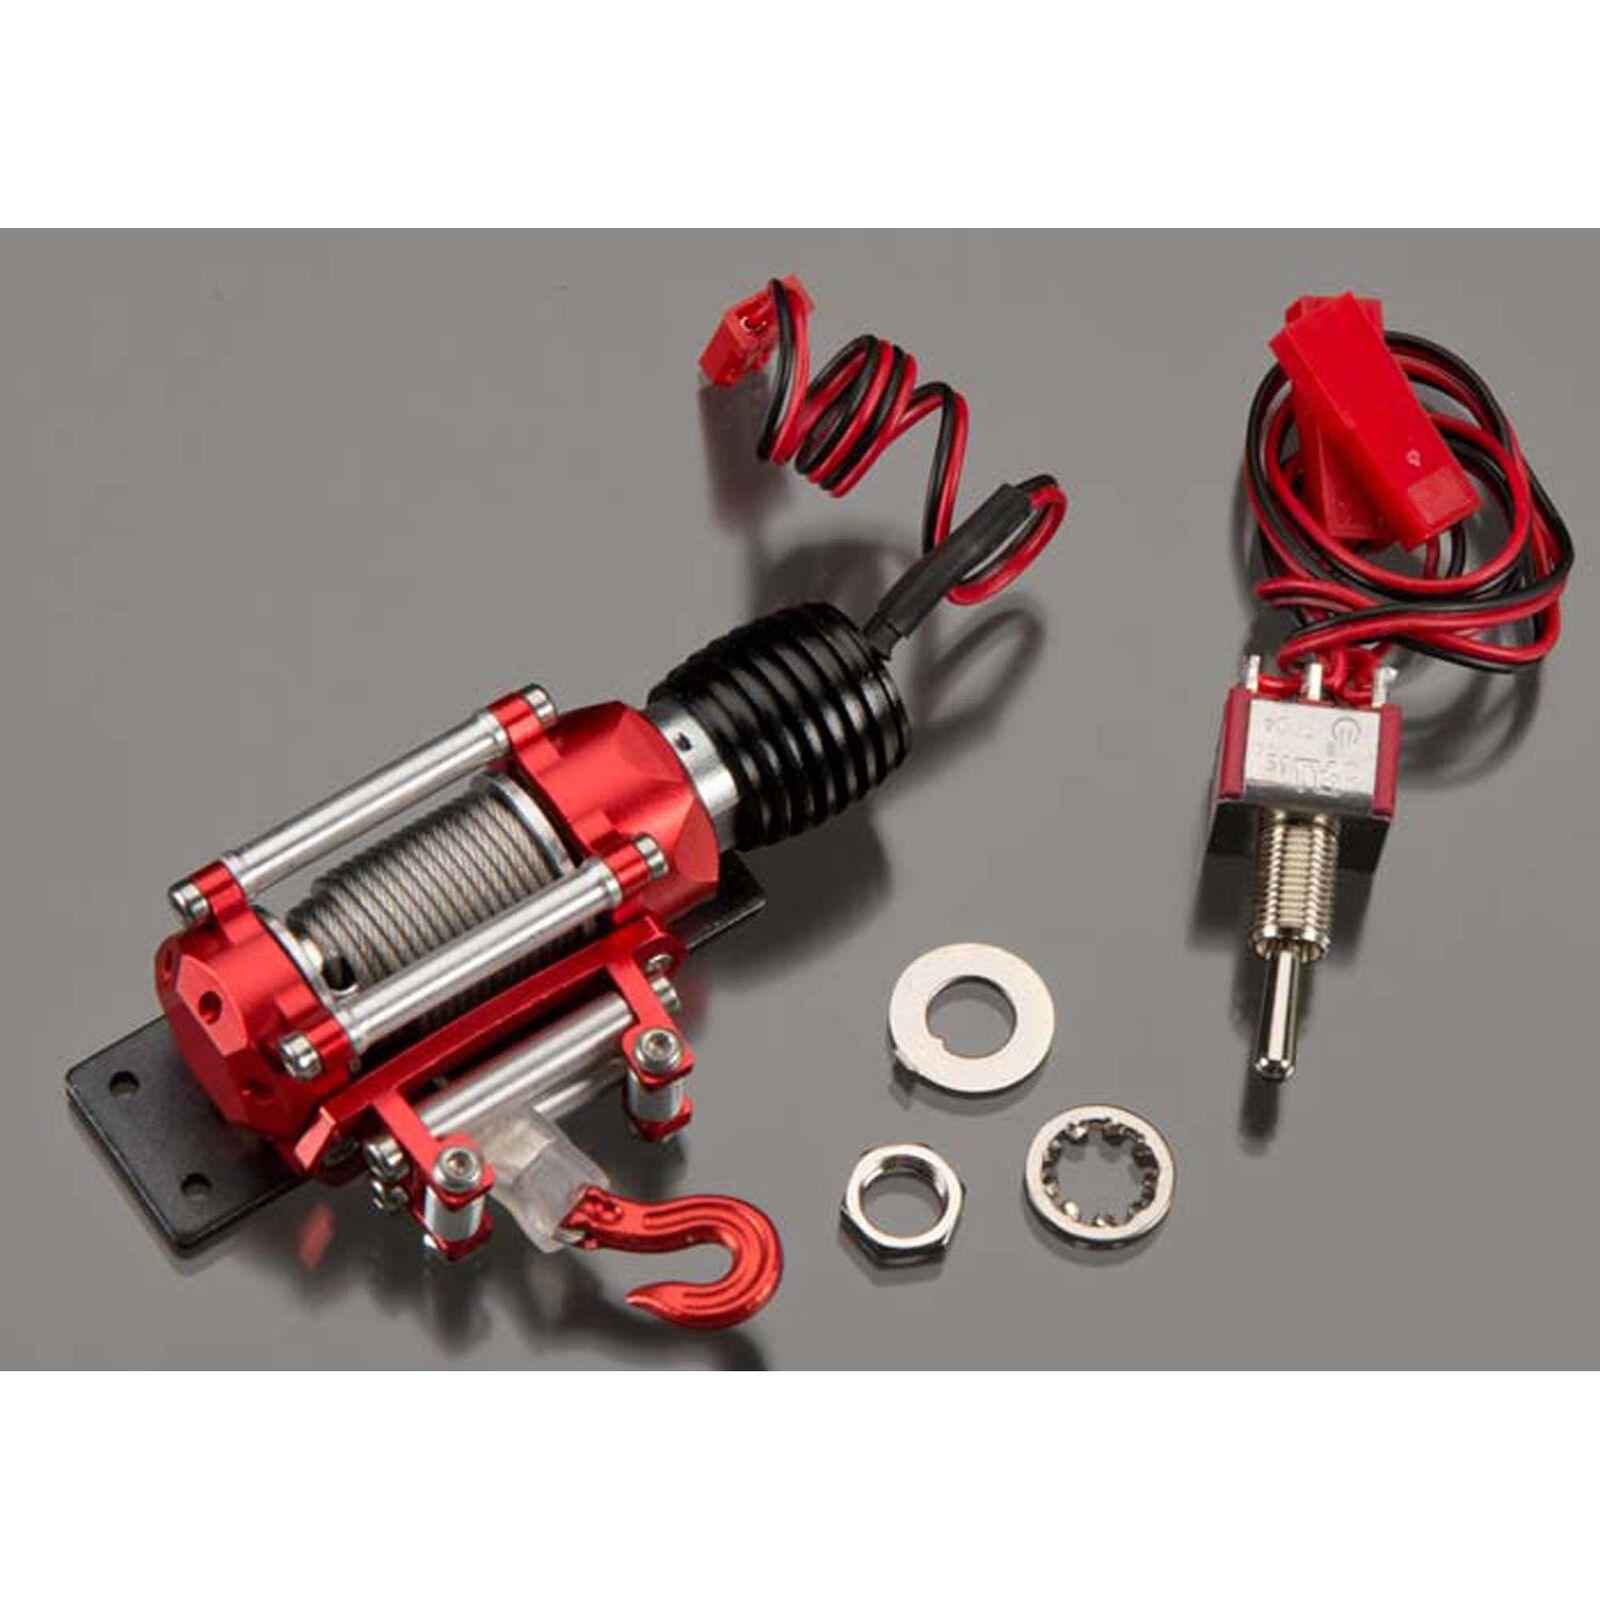 Realistic Power Winch, Red: 1/10 Rock Crawler